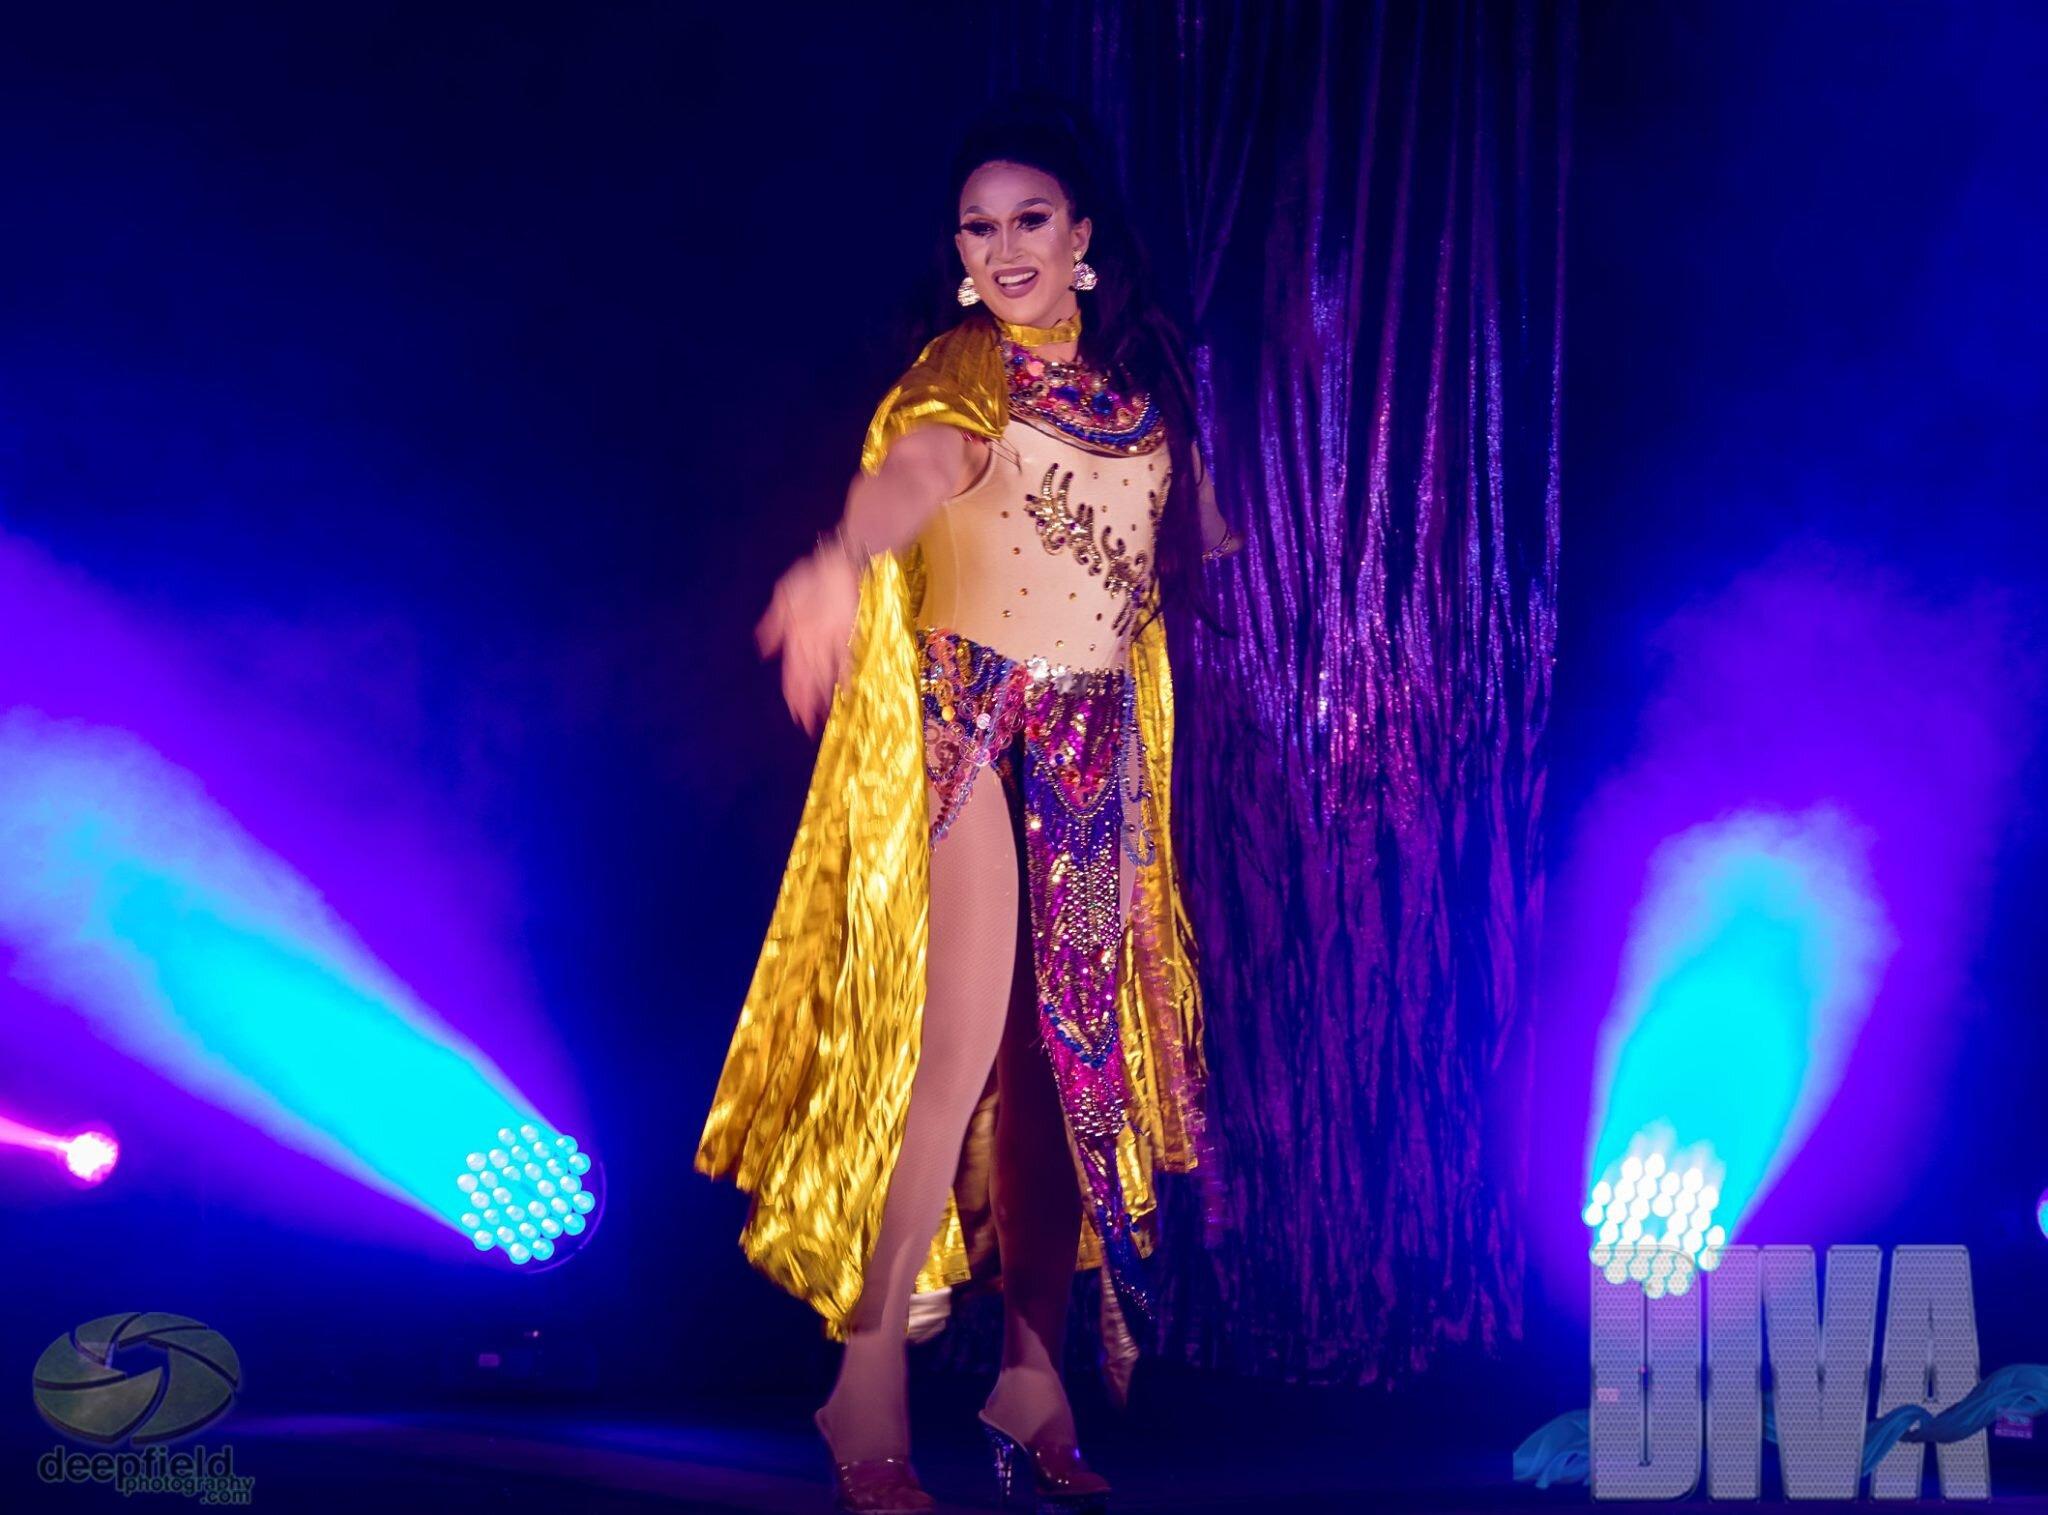 slay-2-stay-danni-issues-show-entertainment-diva-awards-sydney-drag-queen-royalty-best-hire-drag-race-australia-.jpg